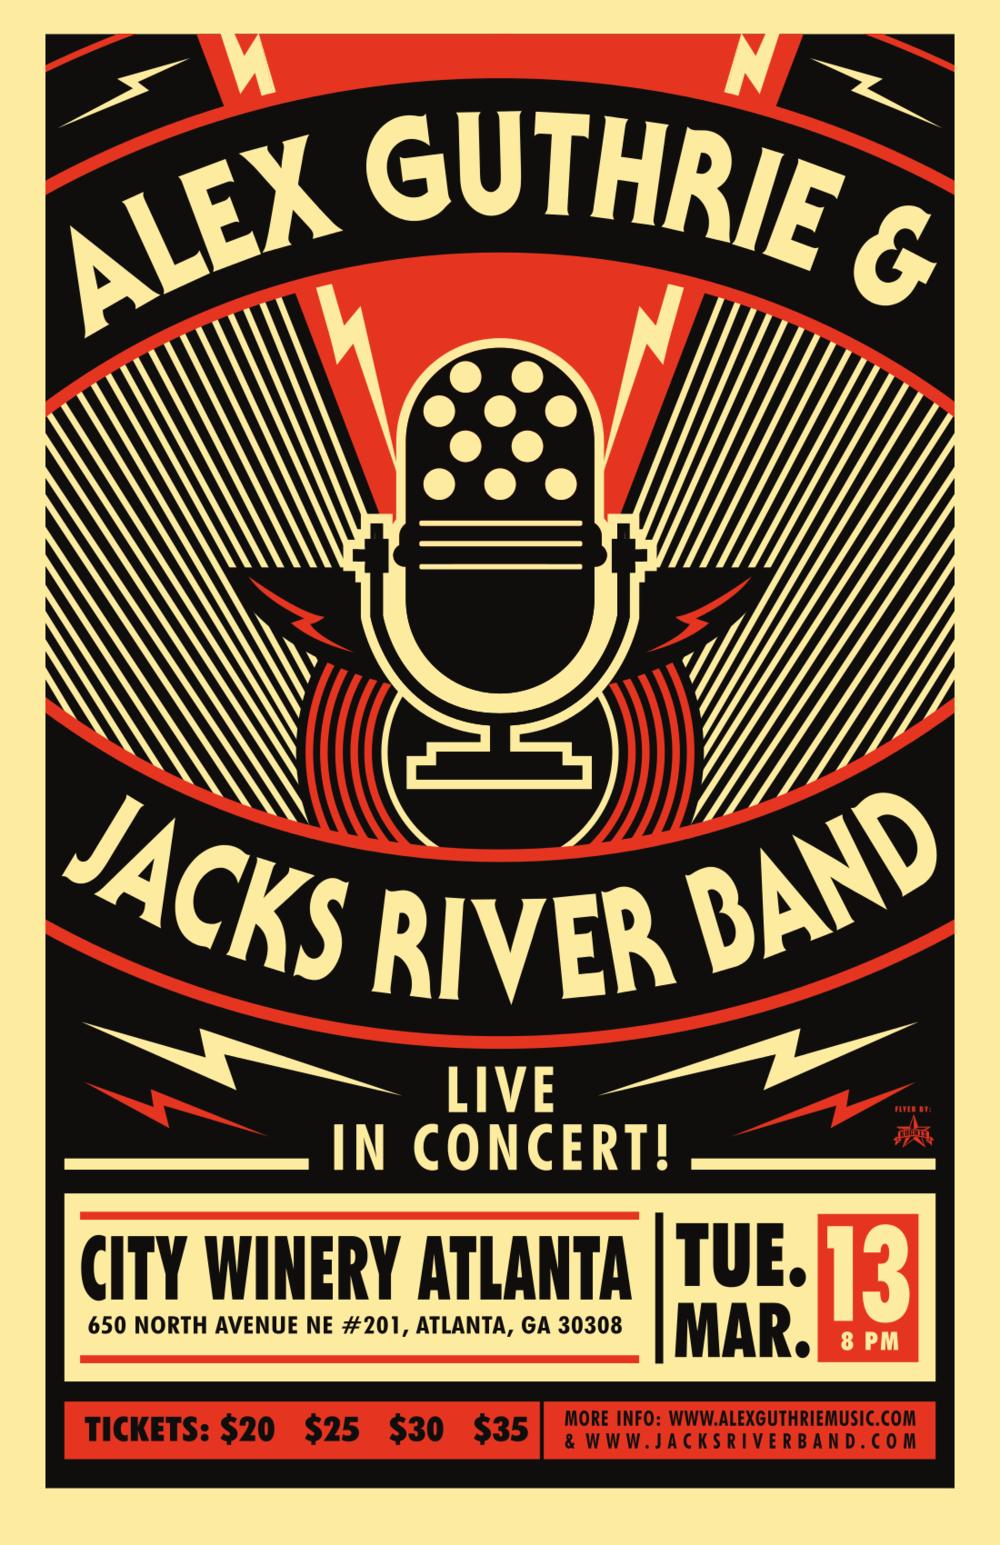 3.13.2018 City Winery, Atlanta, GA - 1. One Eyed Jack2. MNFC ->3. Funkfucious Say ->4. Bullfrog5. Jimmy's Lament6. Frankenstein